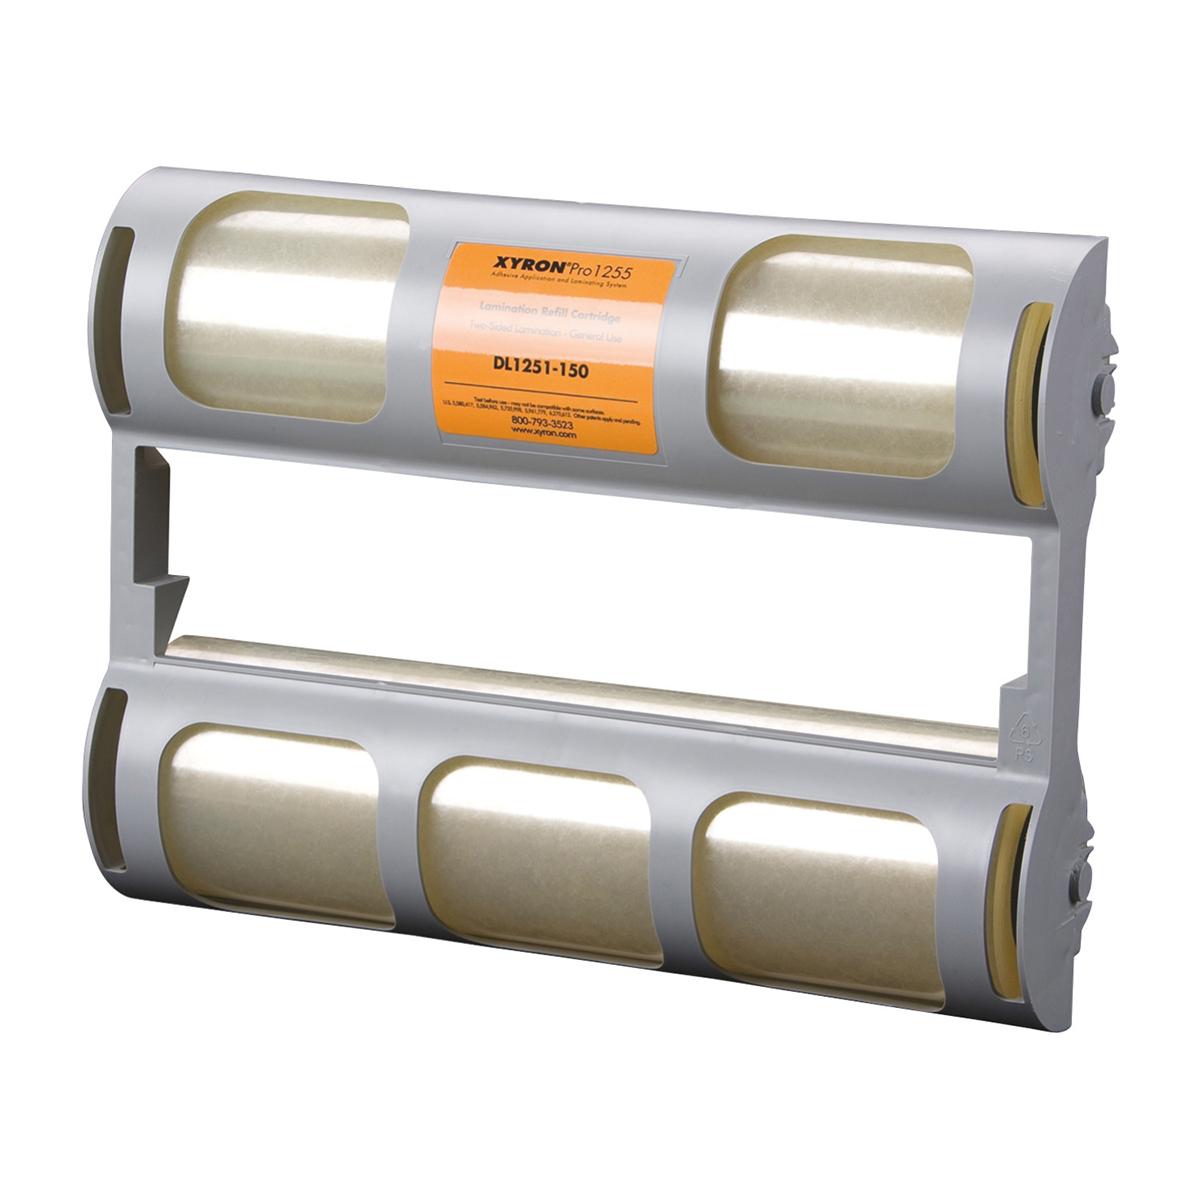 Xyron 23621 Pro Adhesive Film Cartridge AT1251-100